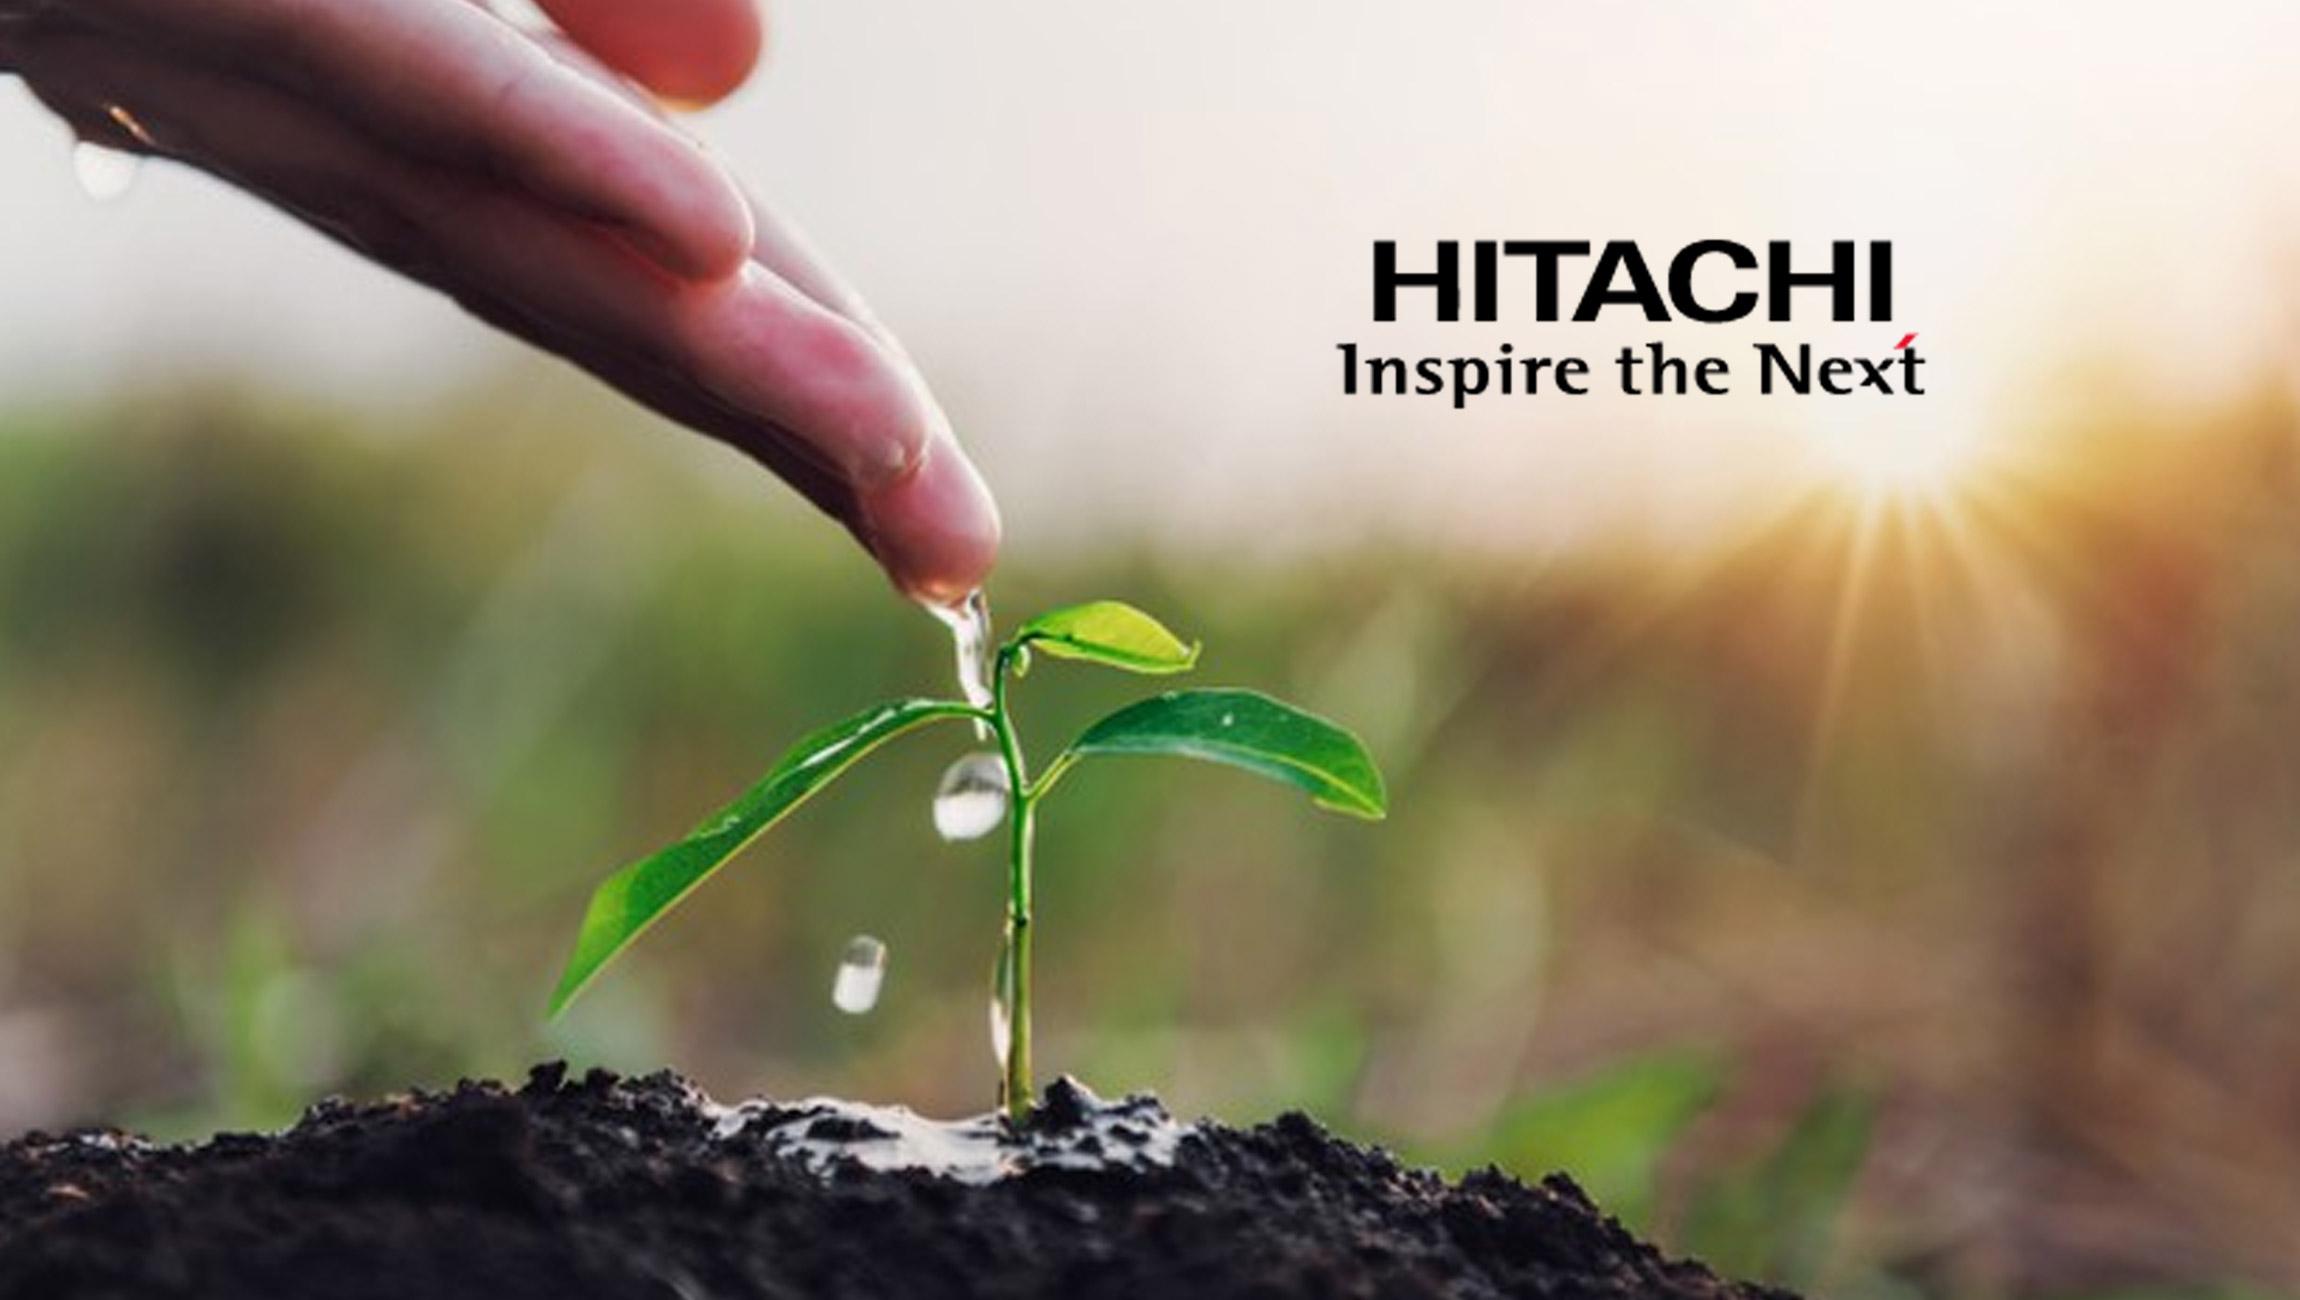 Hitachi Vantara Celebrates Earth Day By Planting 100,000 Trees Around the World With One Tree Planted